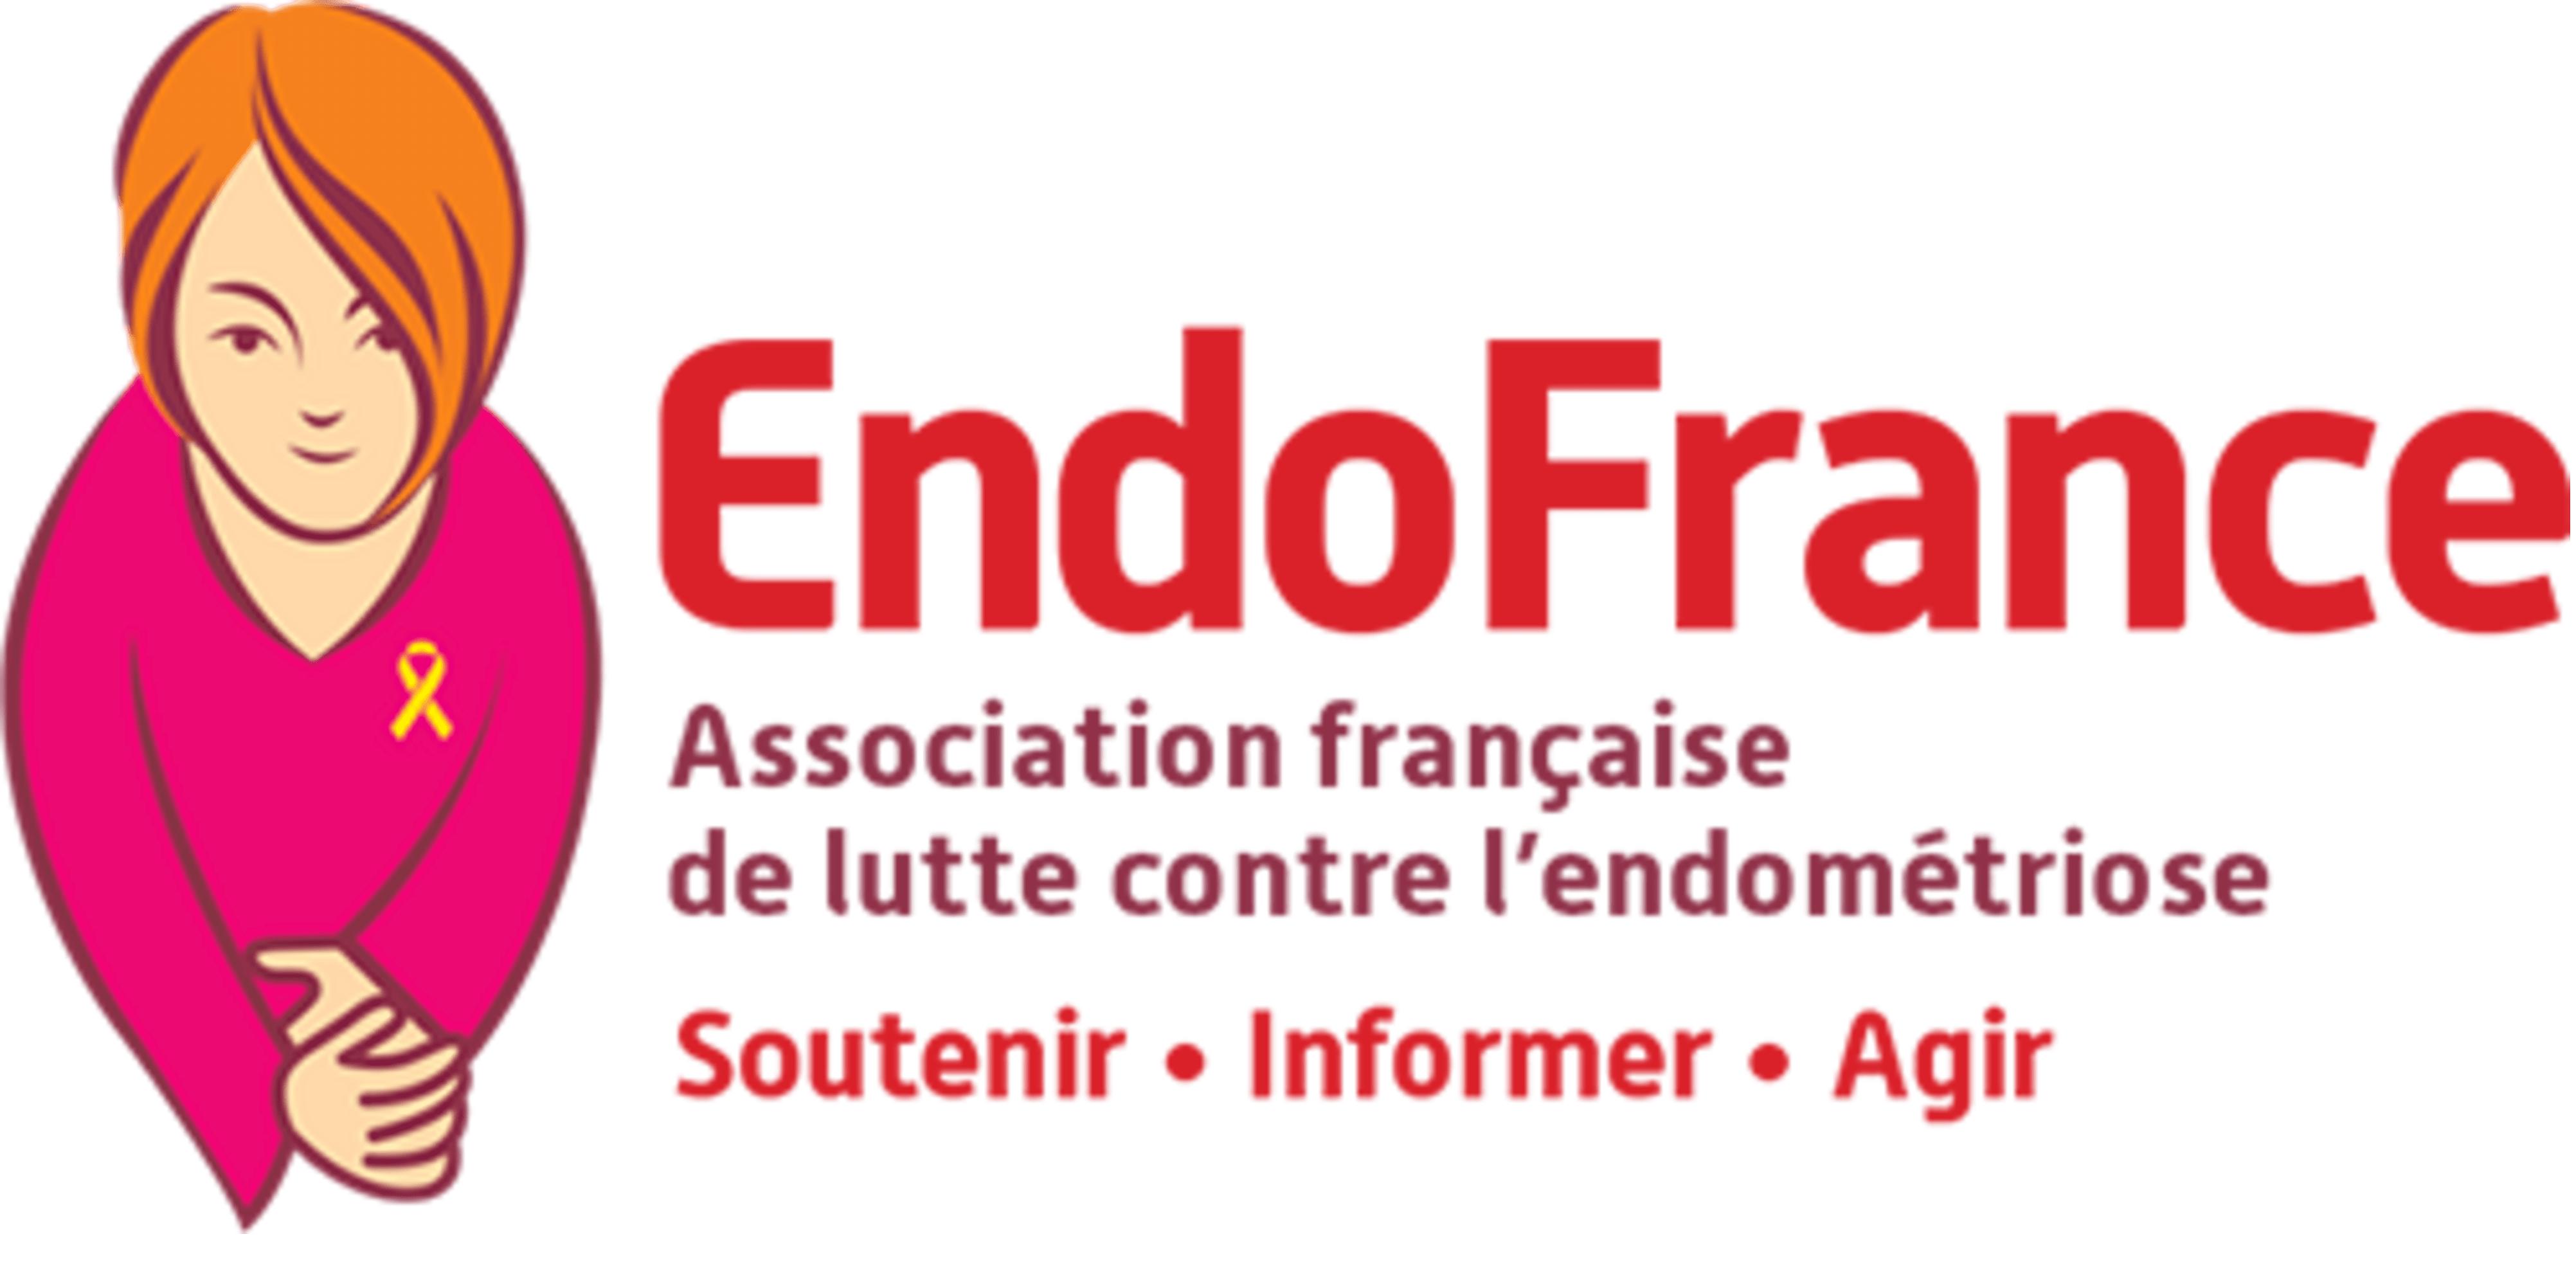 Association endométriose EndoFrance